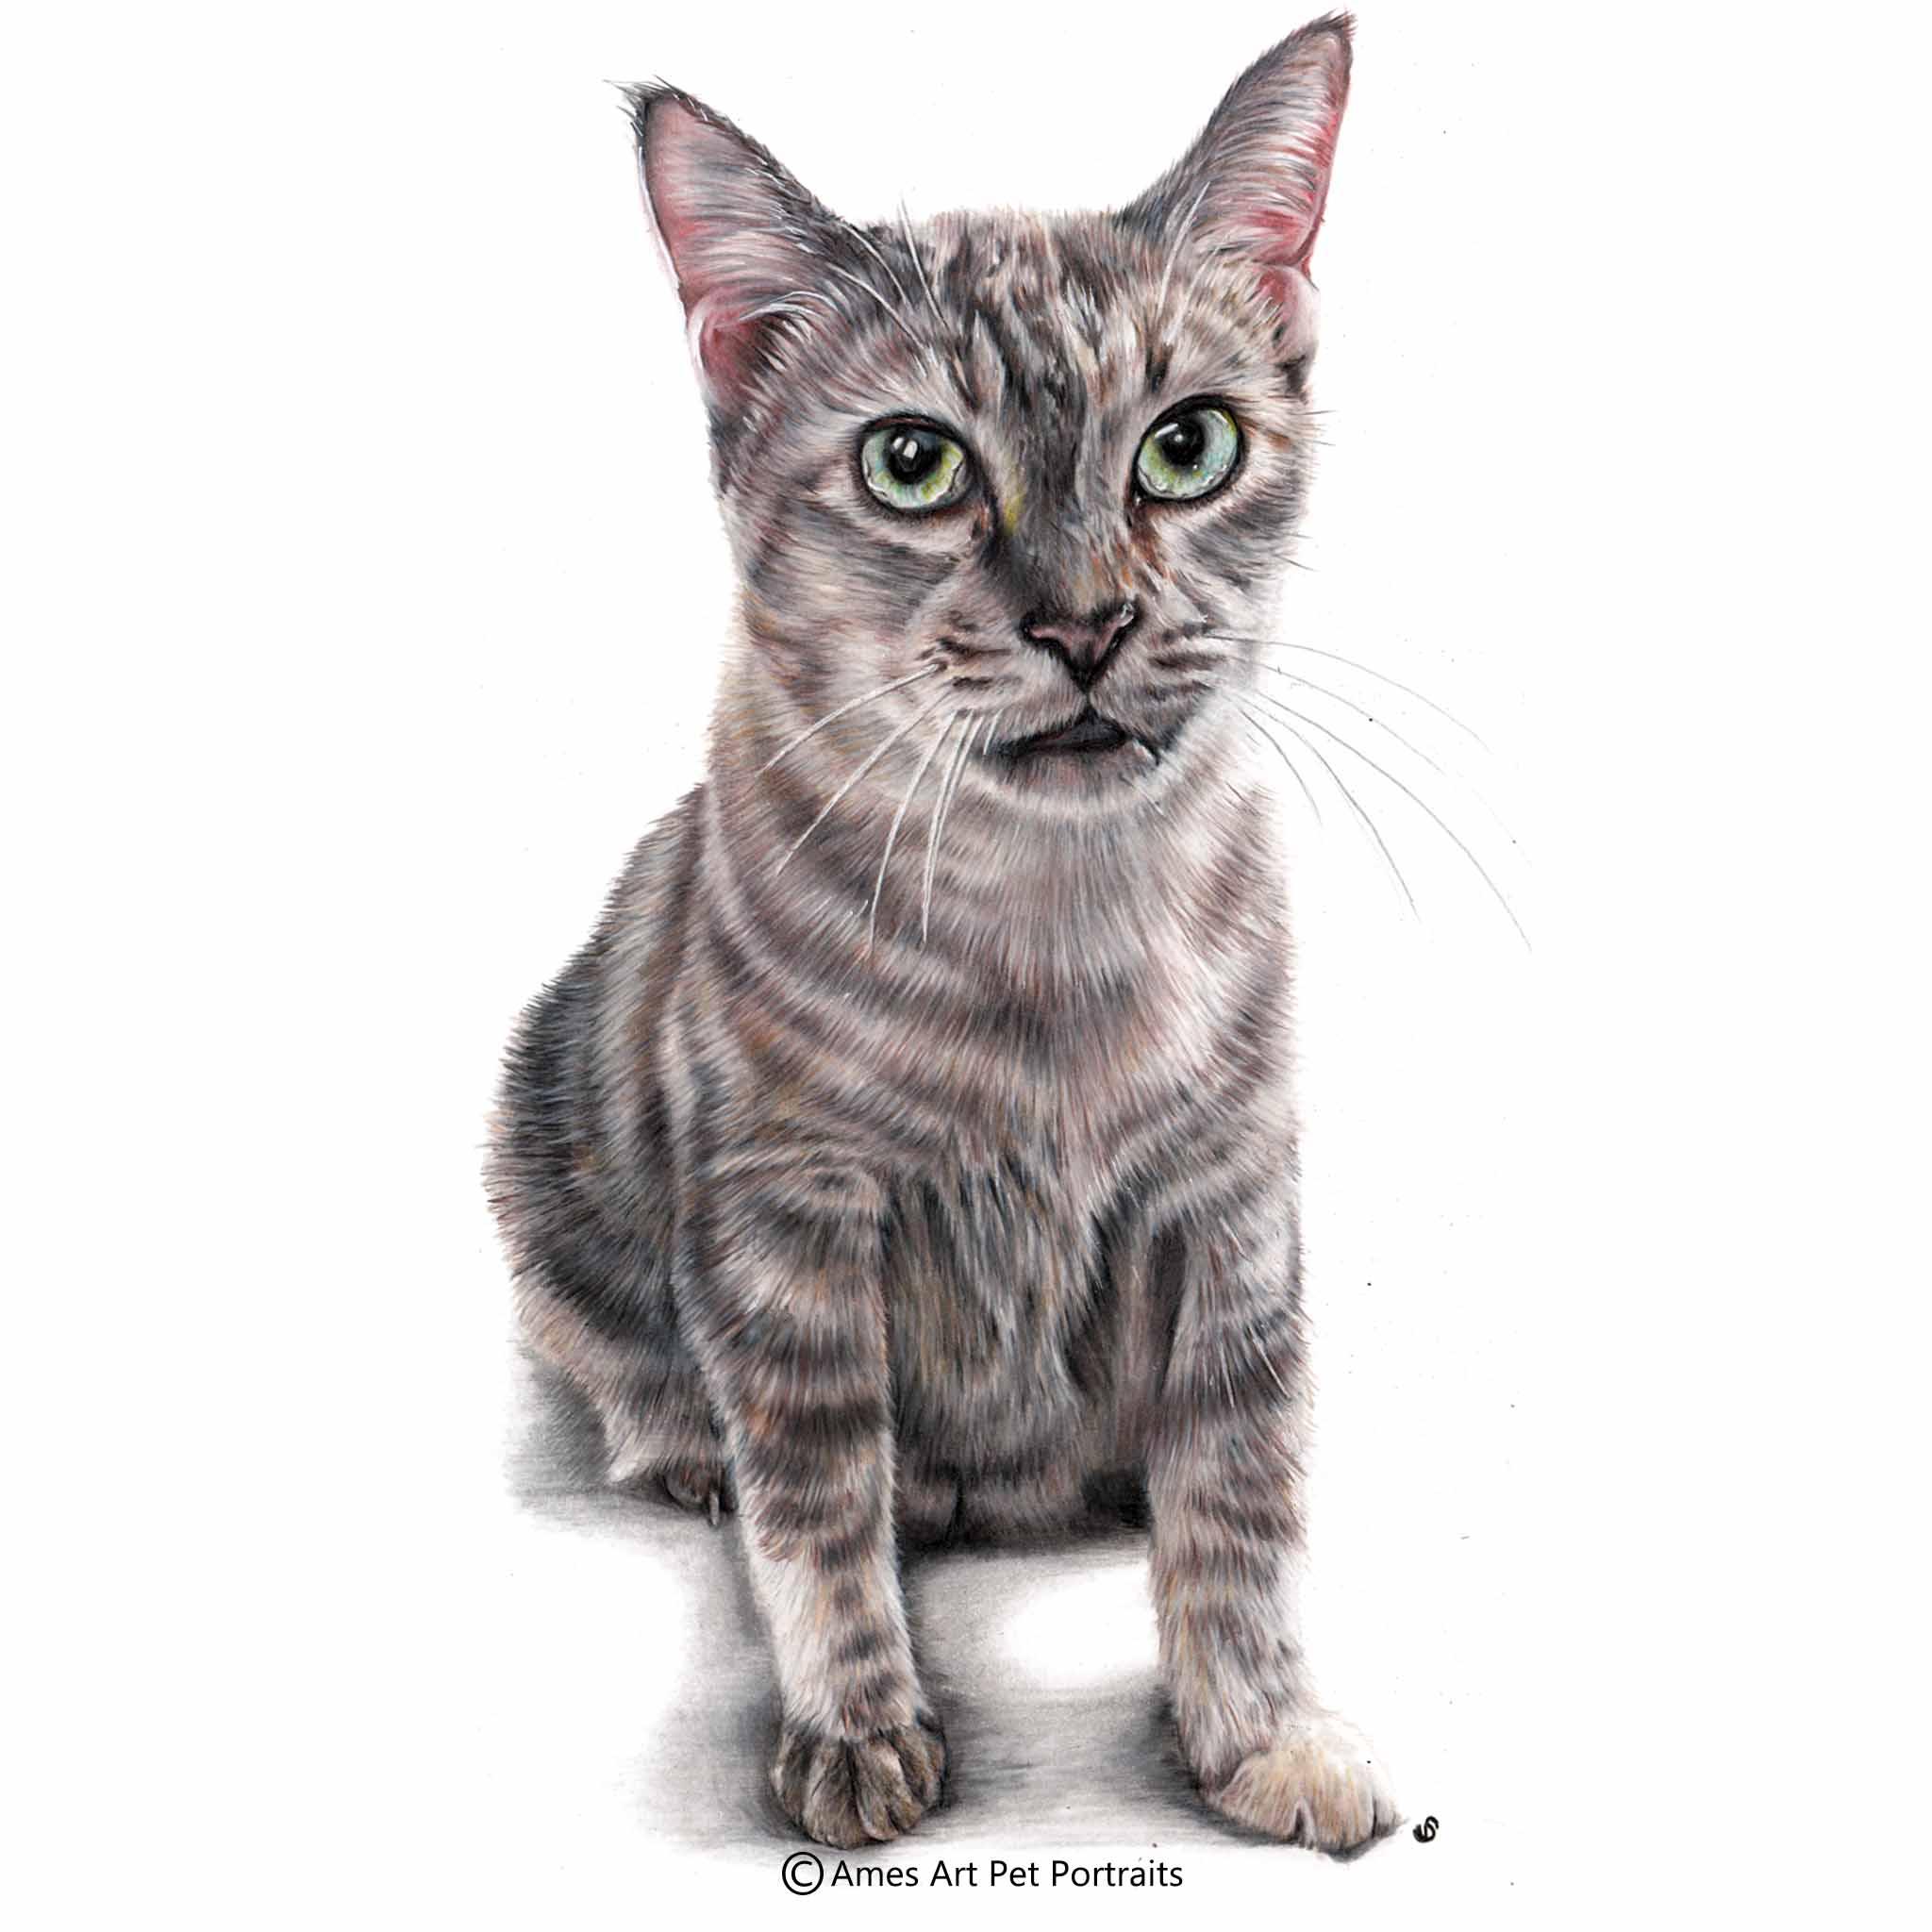 'Buddy' - Singapore, 11.7 x 16.5 in, 2017, Colour Pencil Cat Portrait by Sema Martin